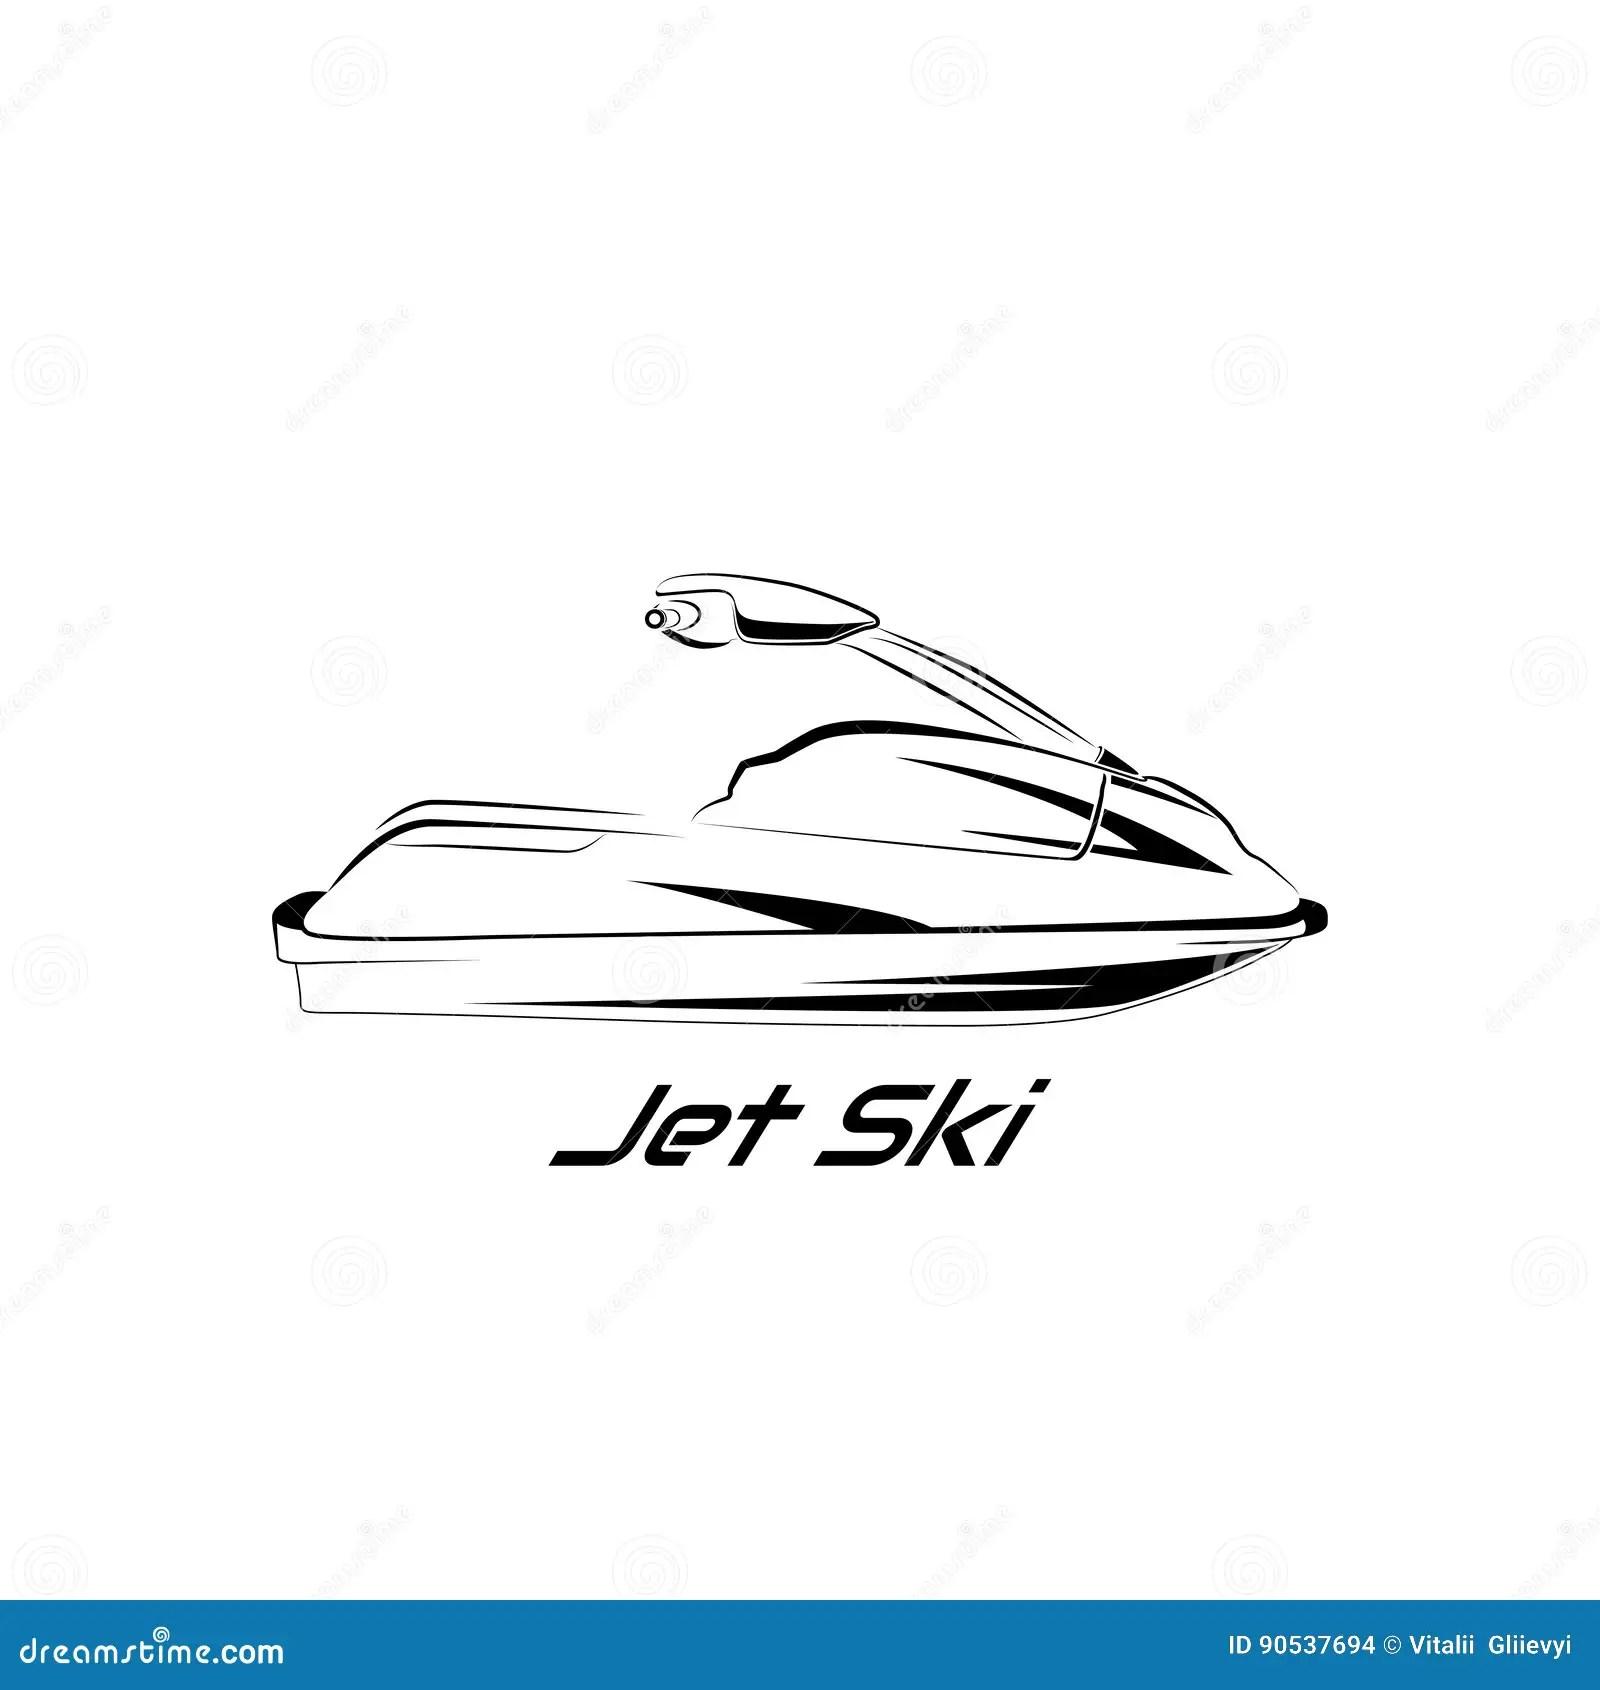 Set jet ski, scooter stock vector. Illustration of rider